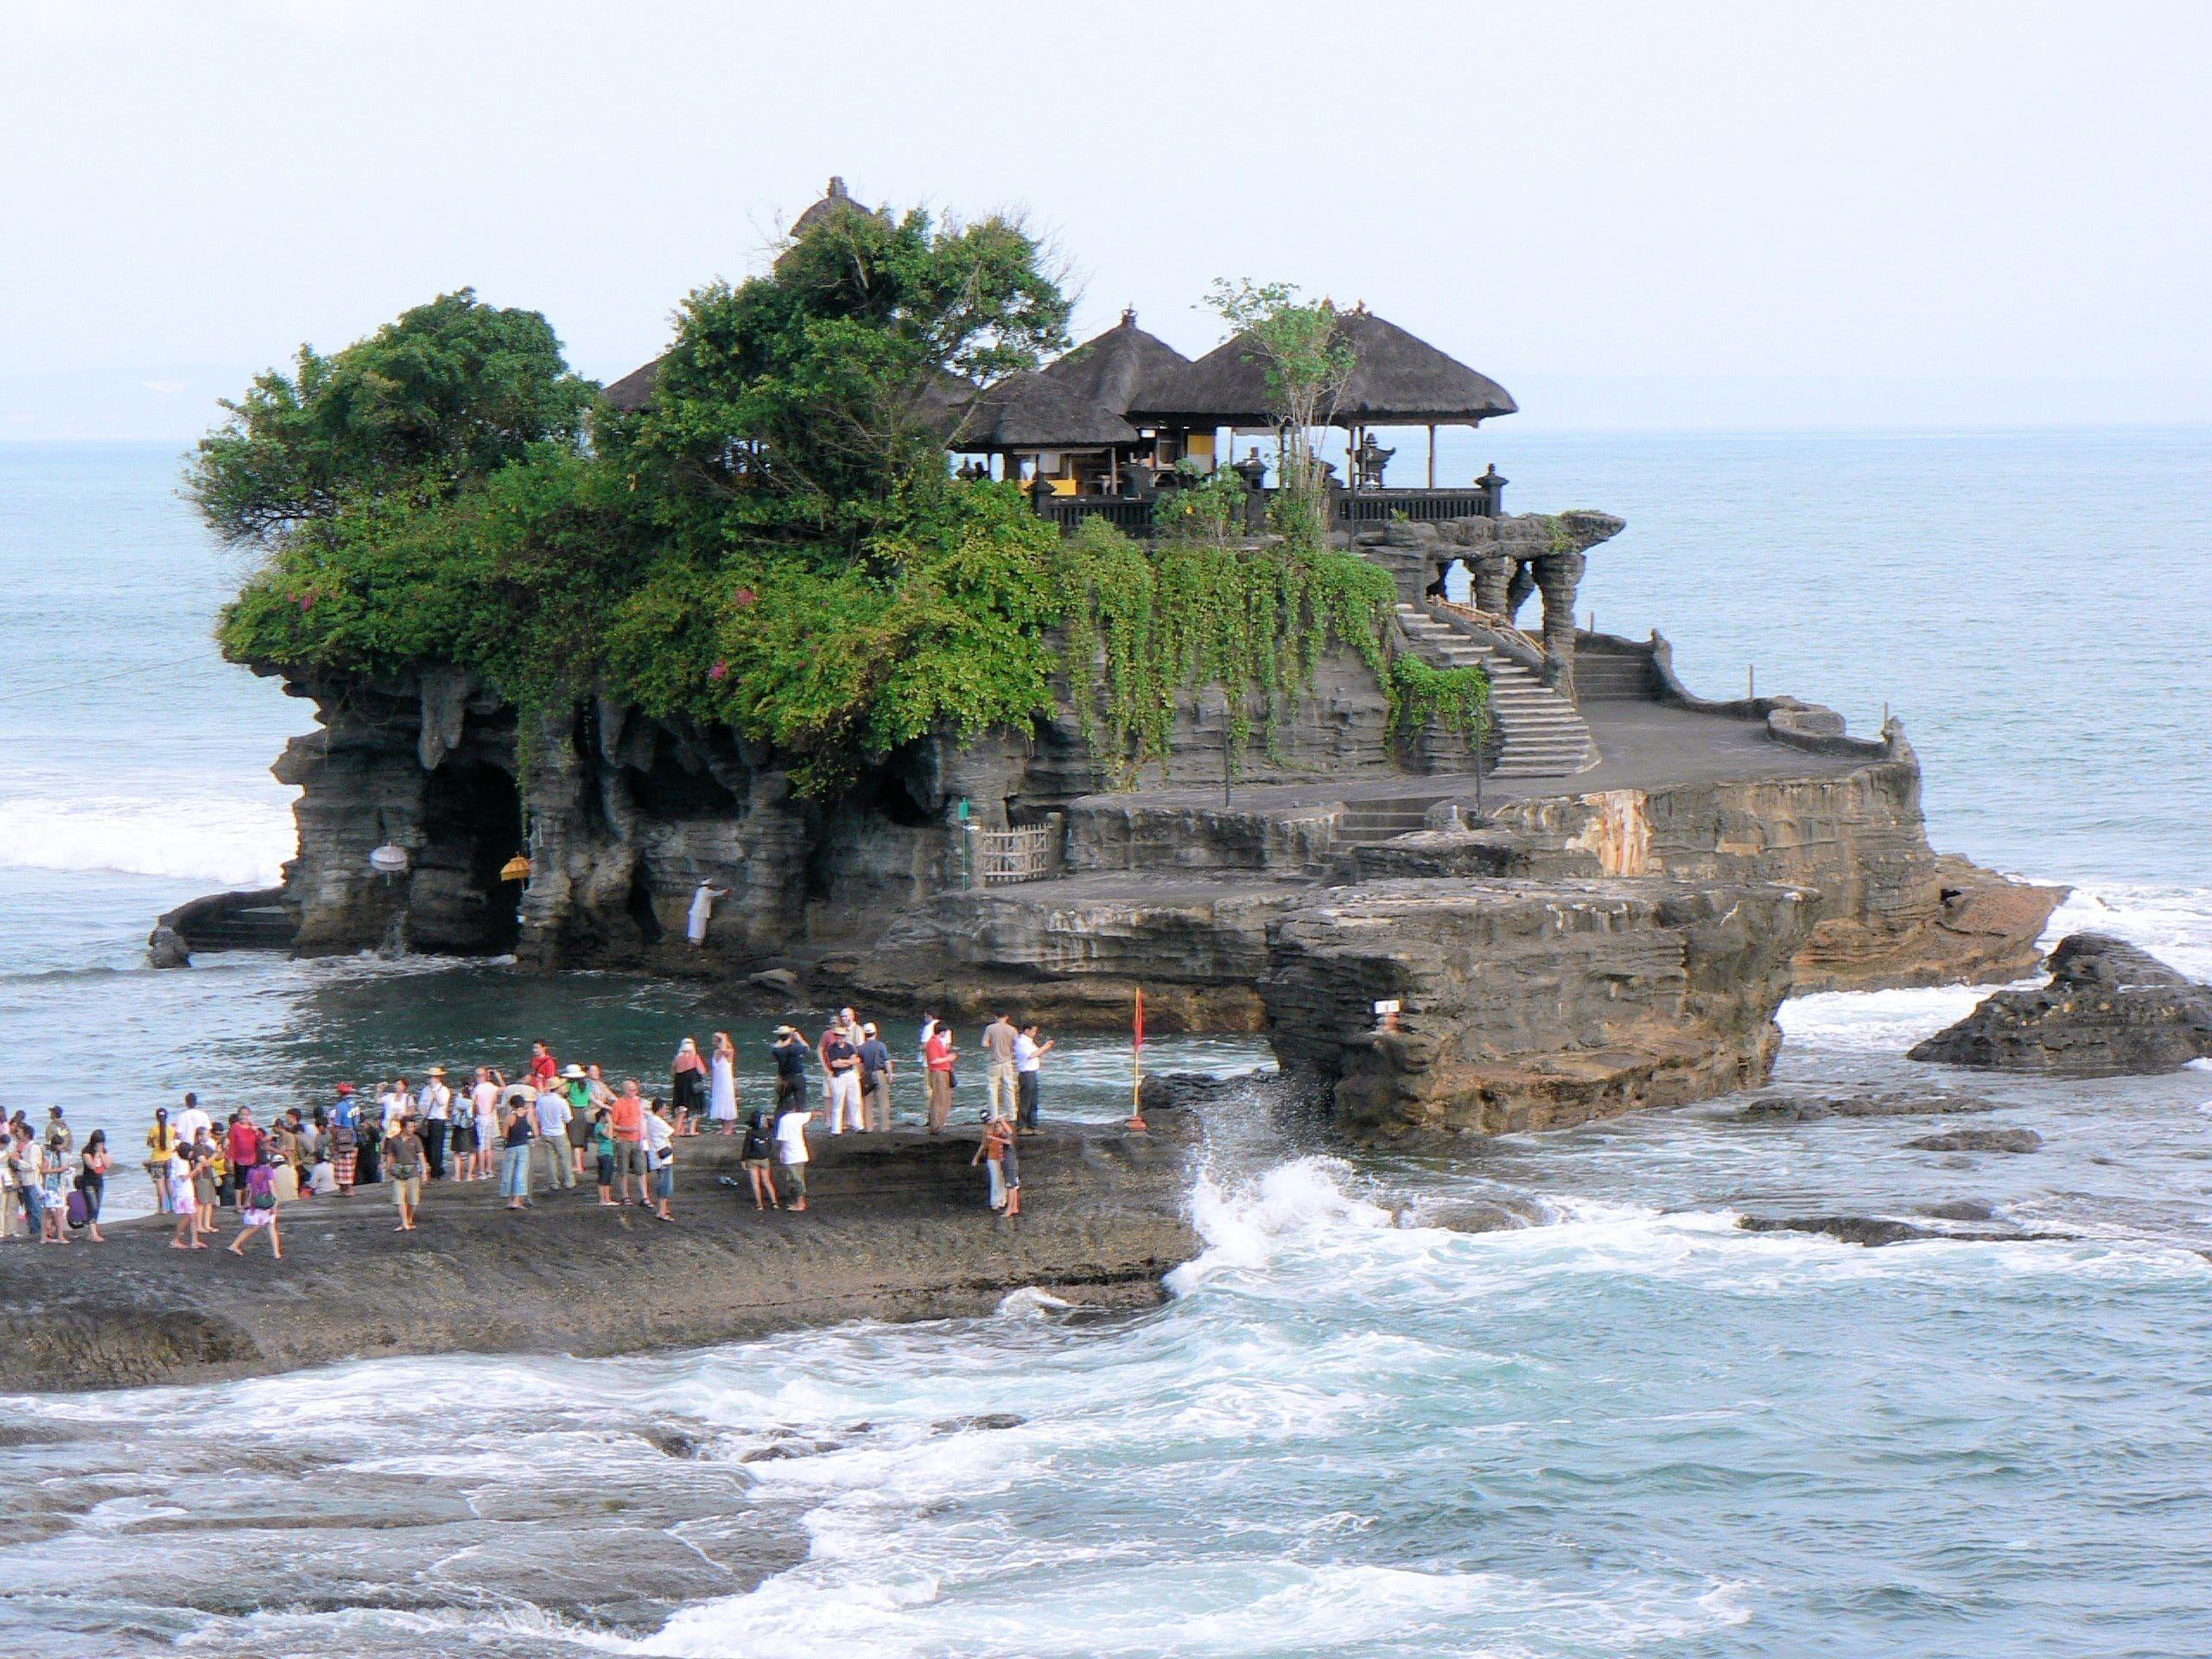 Royalty Free Photo Group Of People On Rock Beside Body Of Water Bali Temple Tanah Lot Sea Beach Built Structure Pariwisata Pemandangan Bali